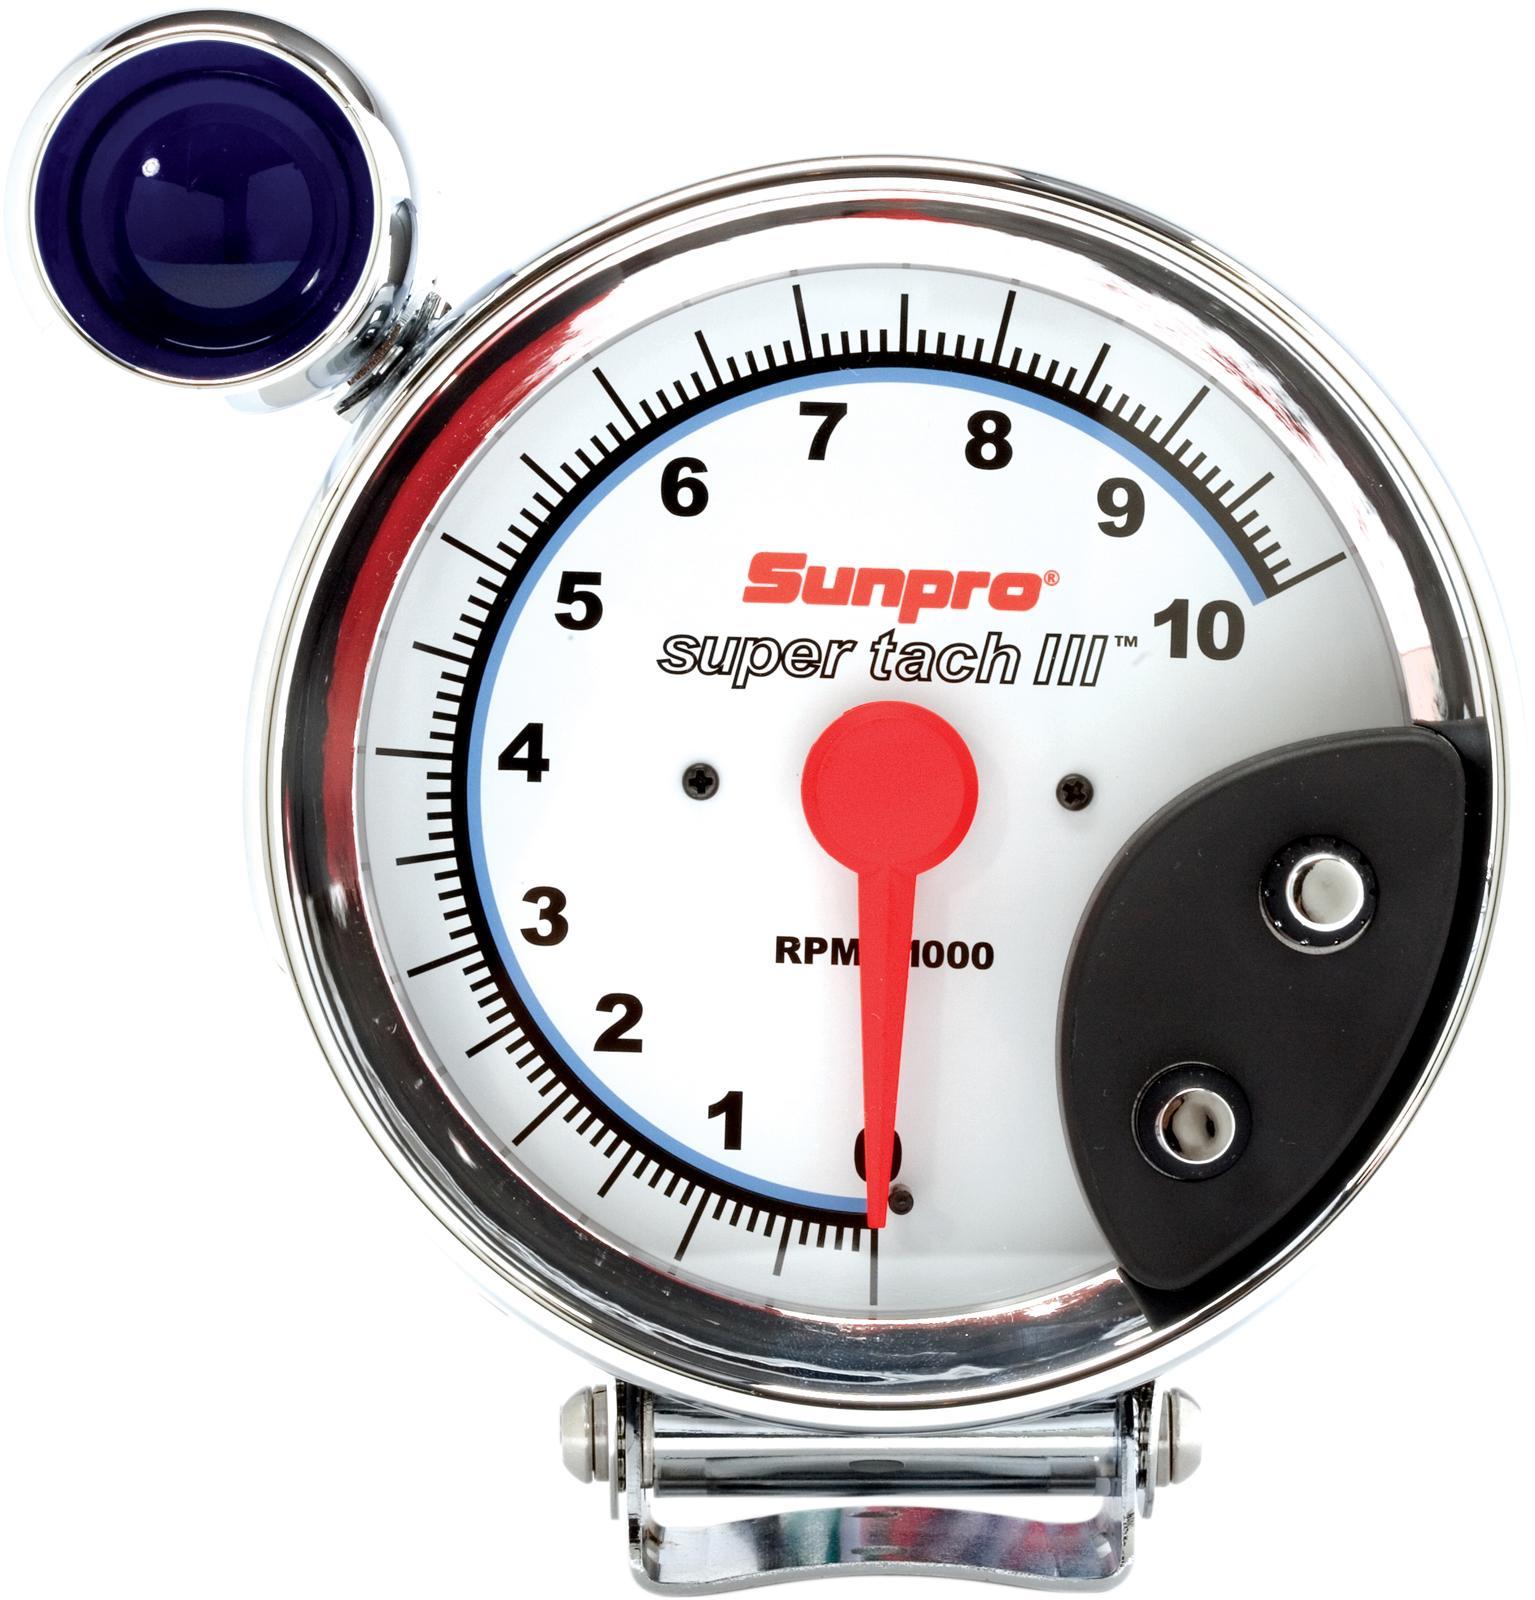 sunpro super tach 3 wiring diagram honda accord parts sun iii tachometers cp7914 free